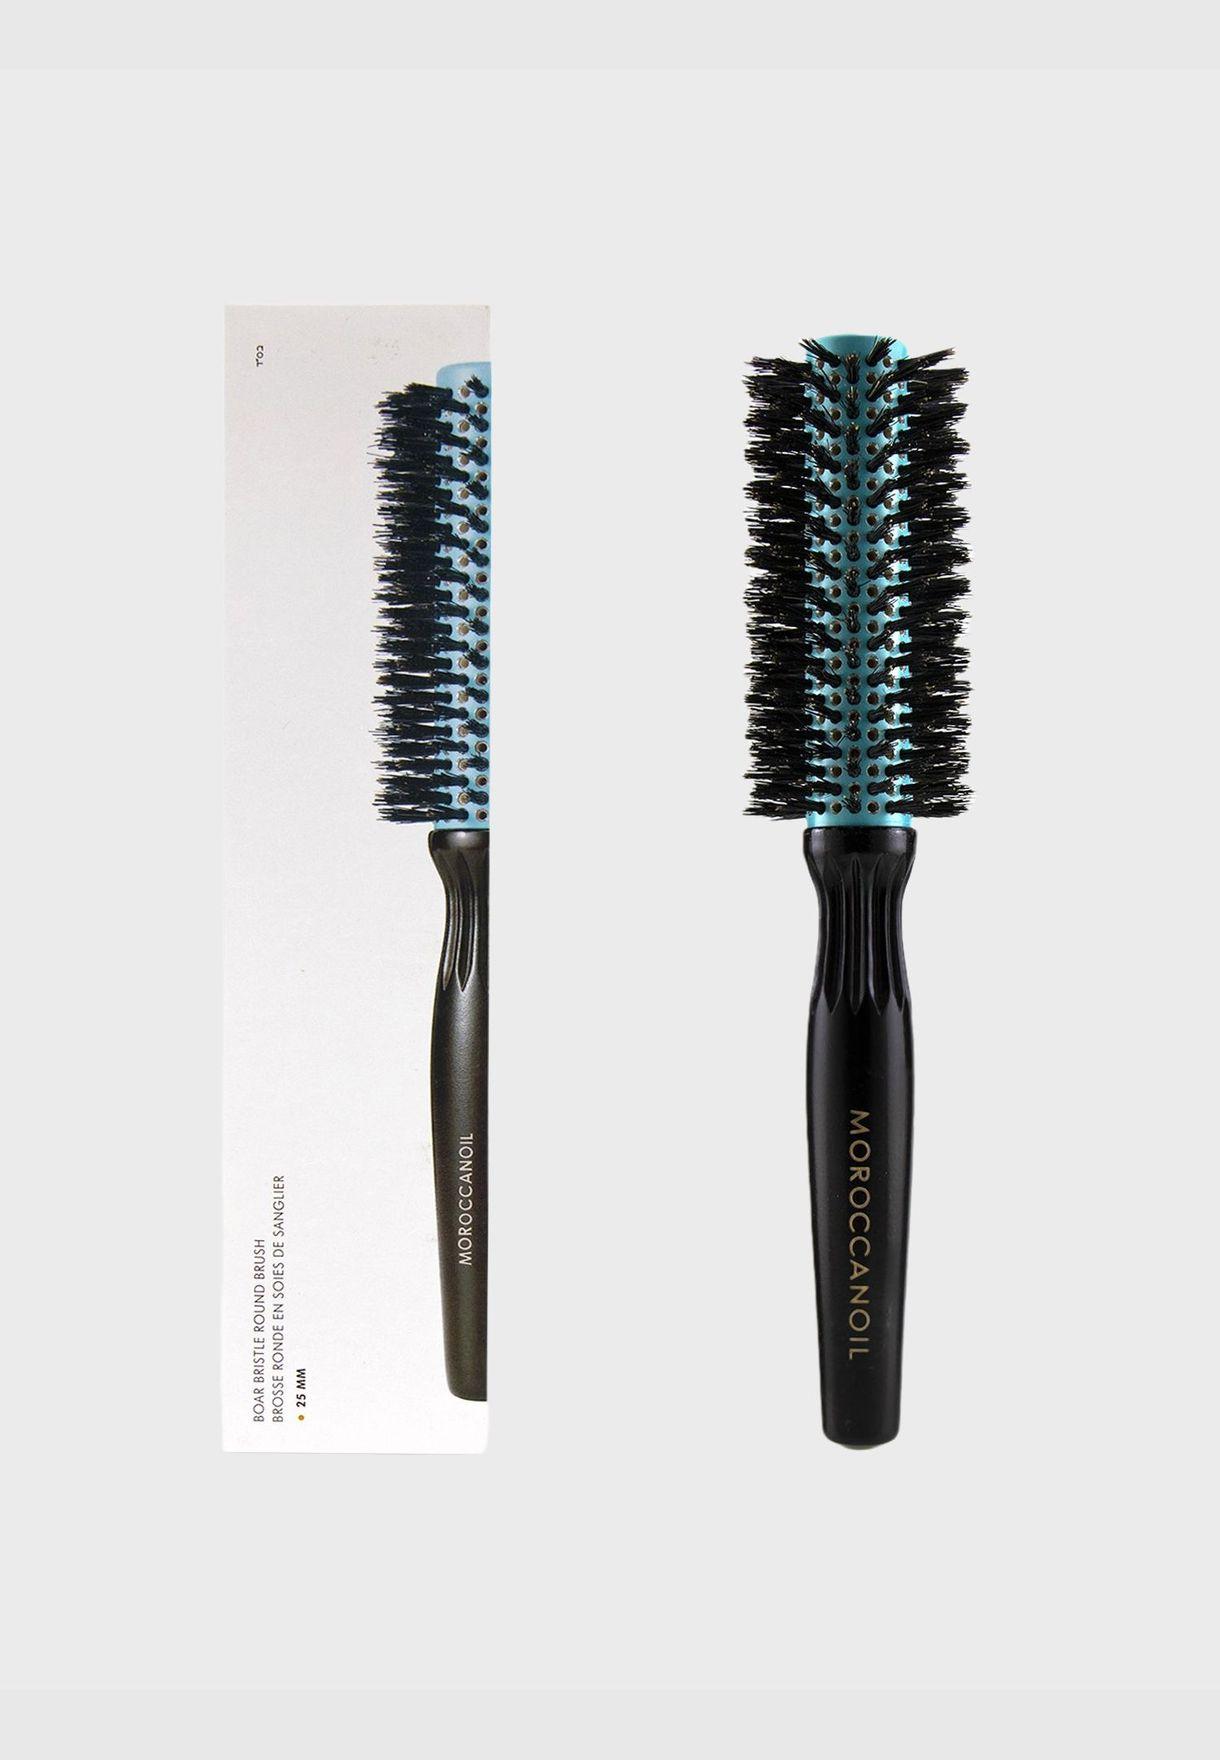 Boar Bristle Round Brush - # 25MM